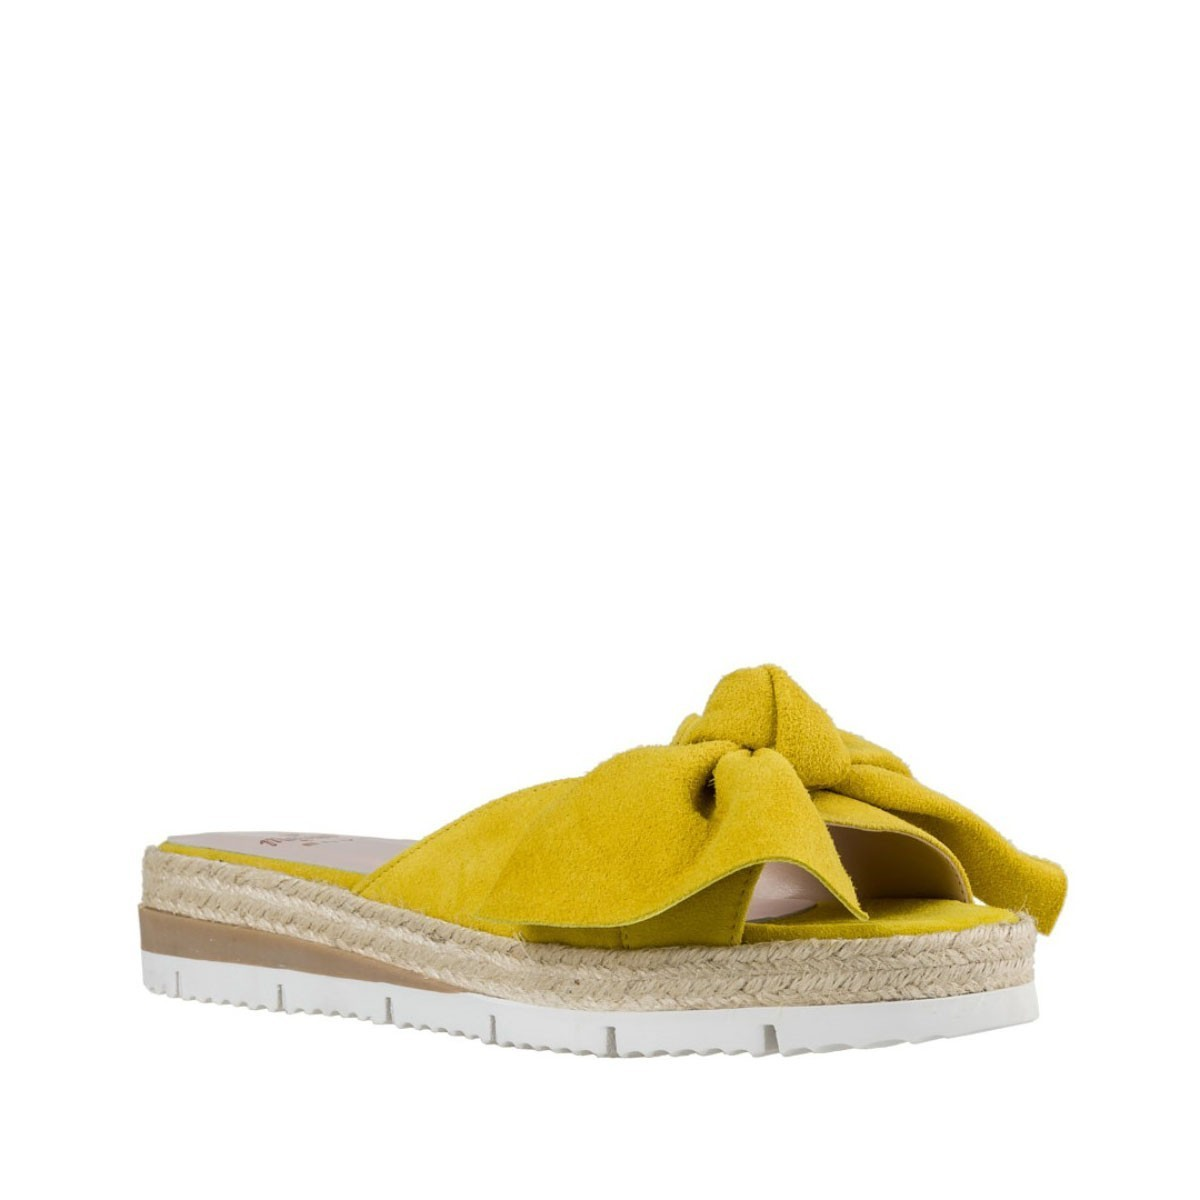 Mairiboo by Envie Shoes Γυναικείες Παντόφλες M03-05914 Κίτρινο Mairiboo M03-05914 Κίτρινο